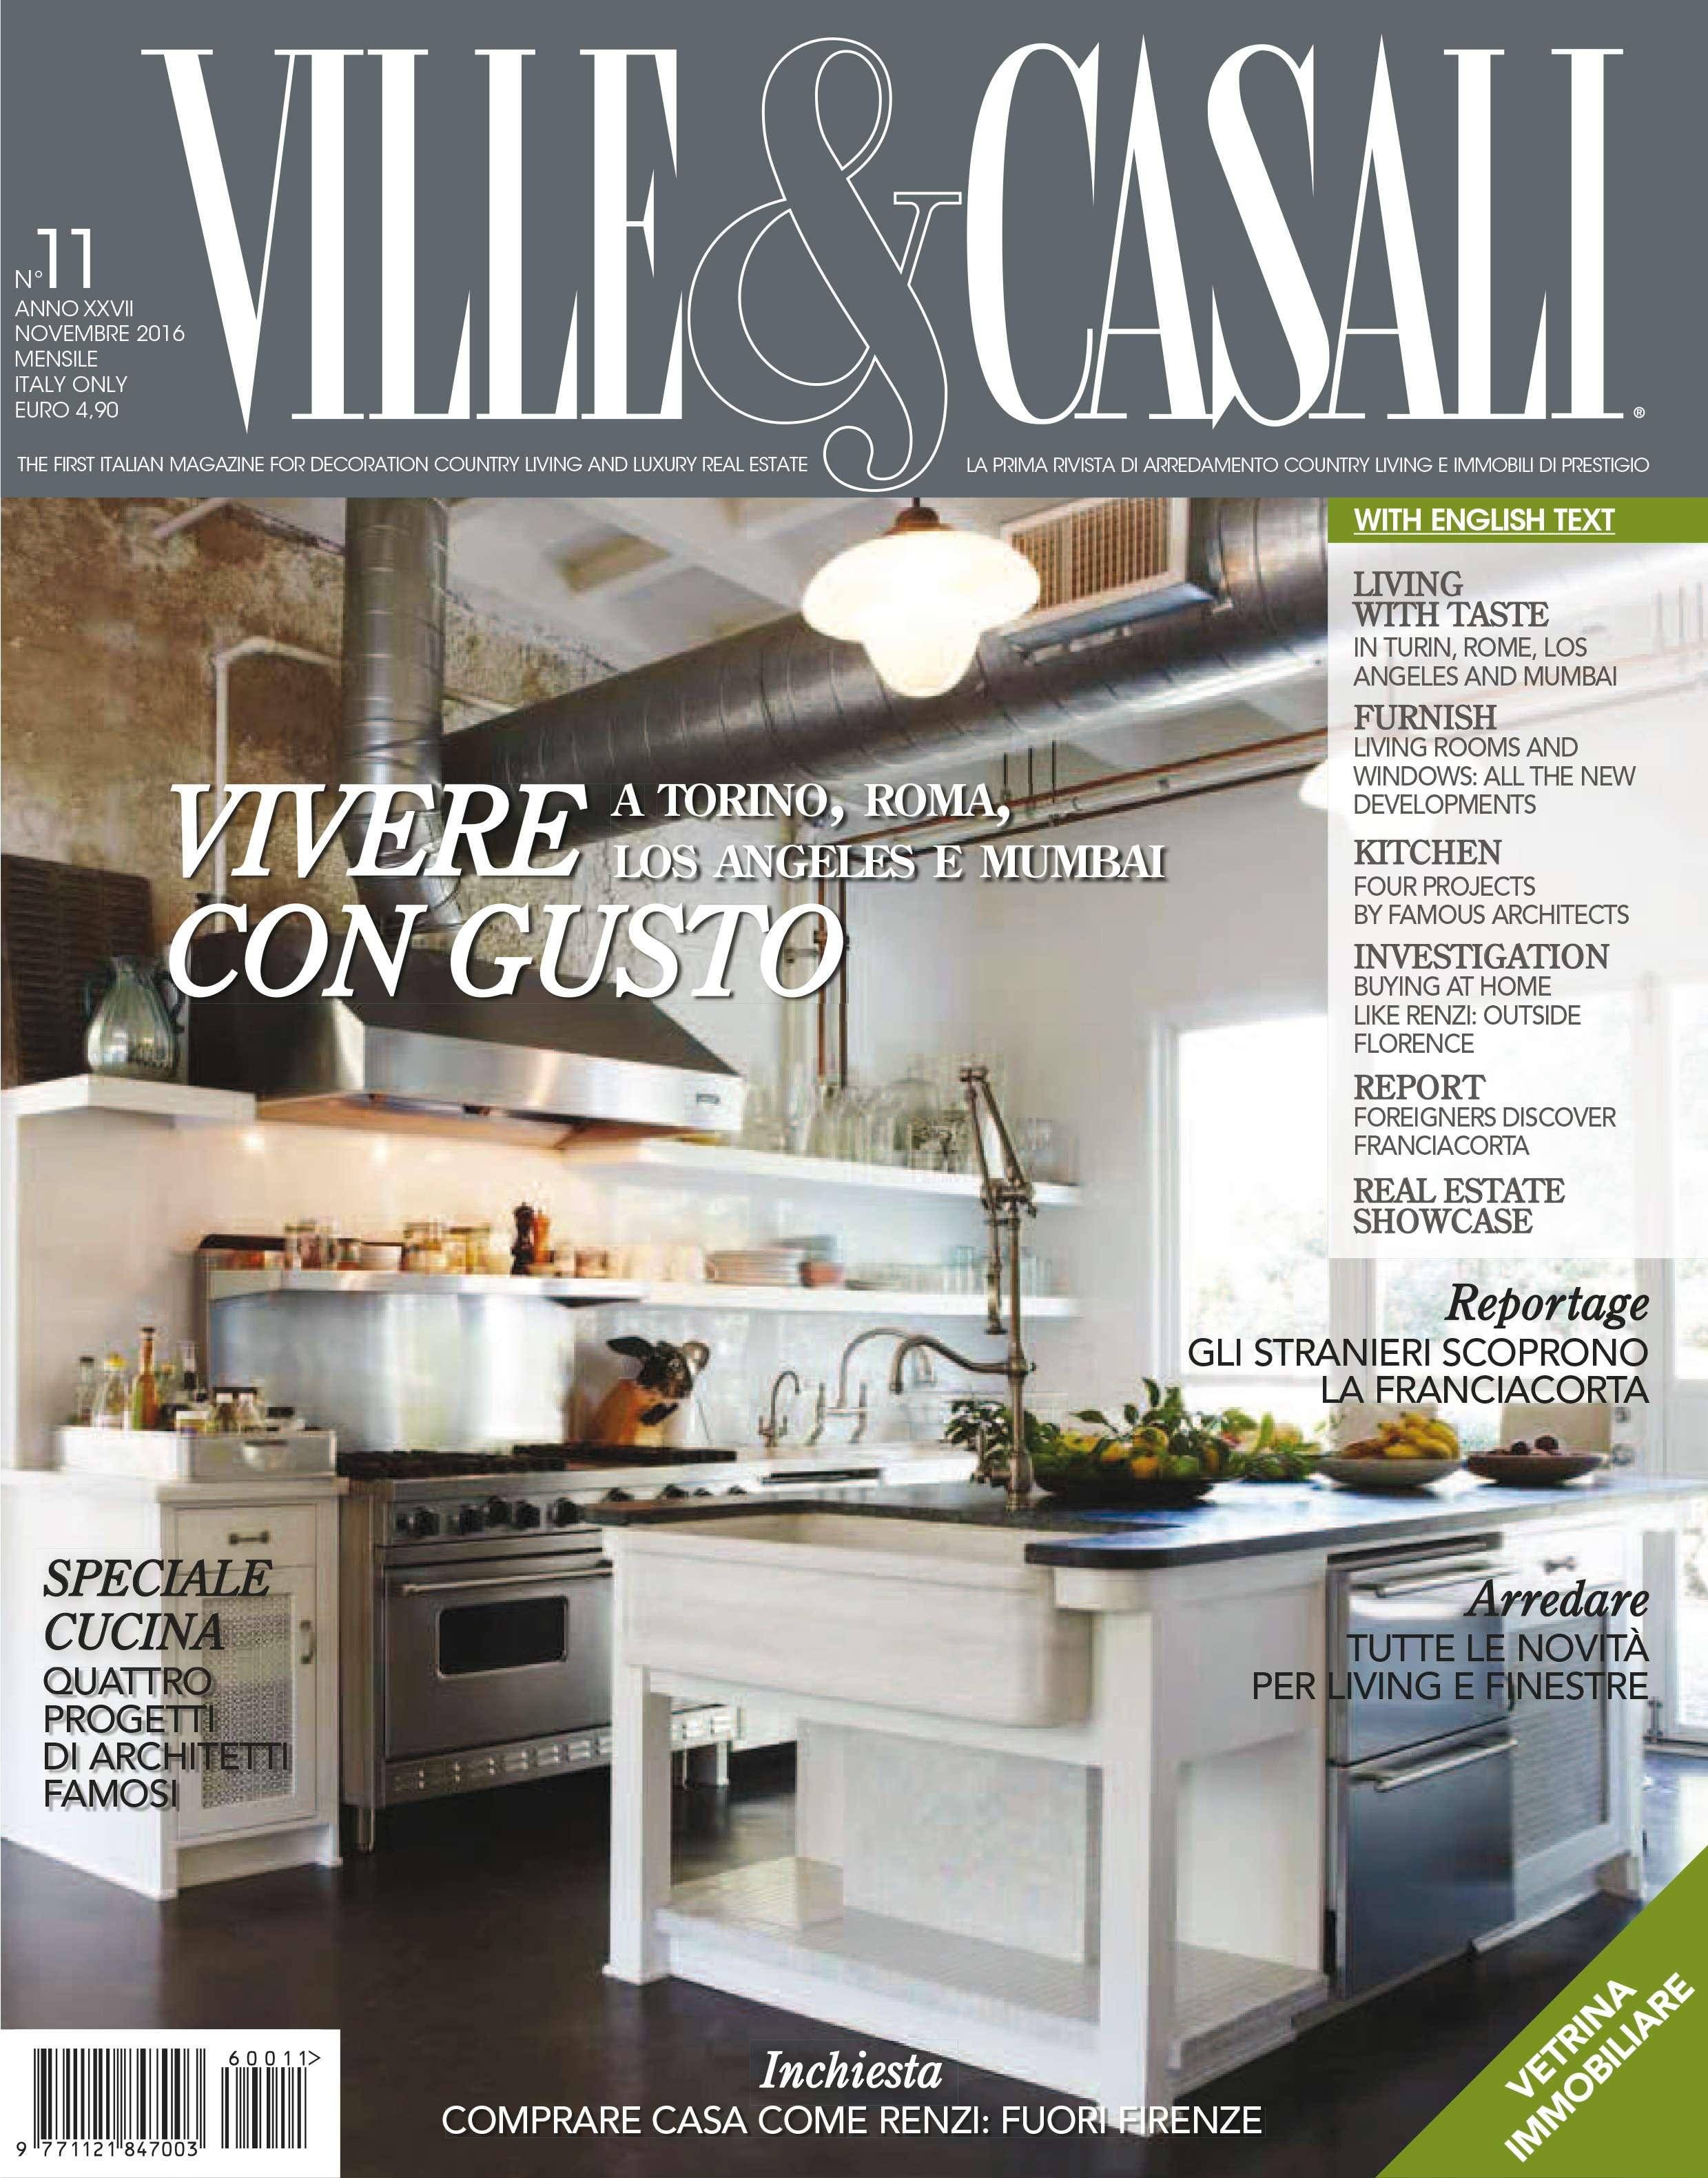 Arredamento Per Casali ville e casali, november 2016 - garden house lazzerini